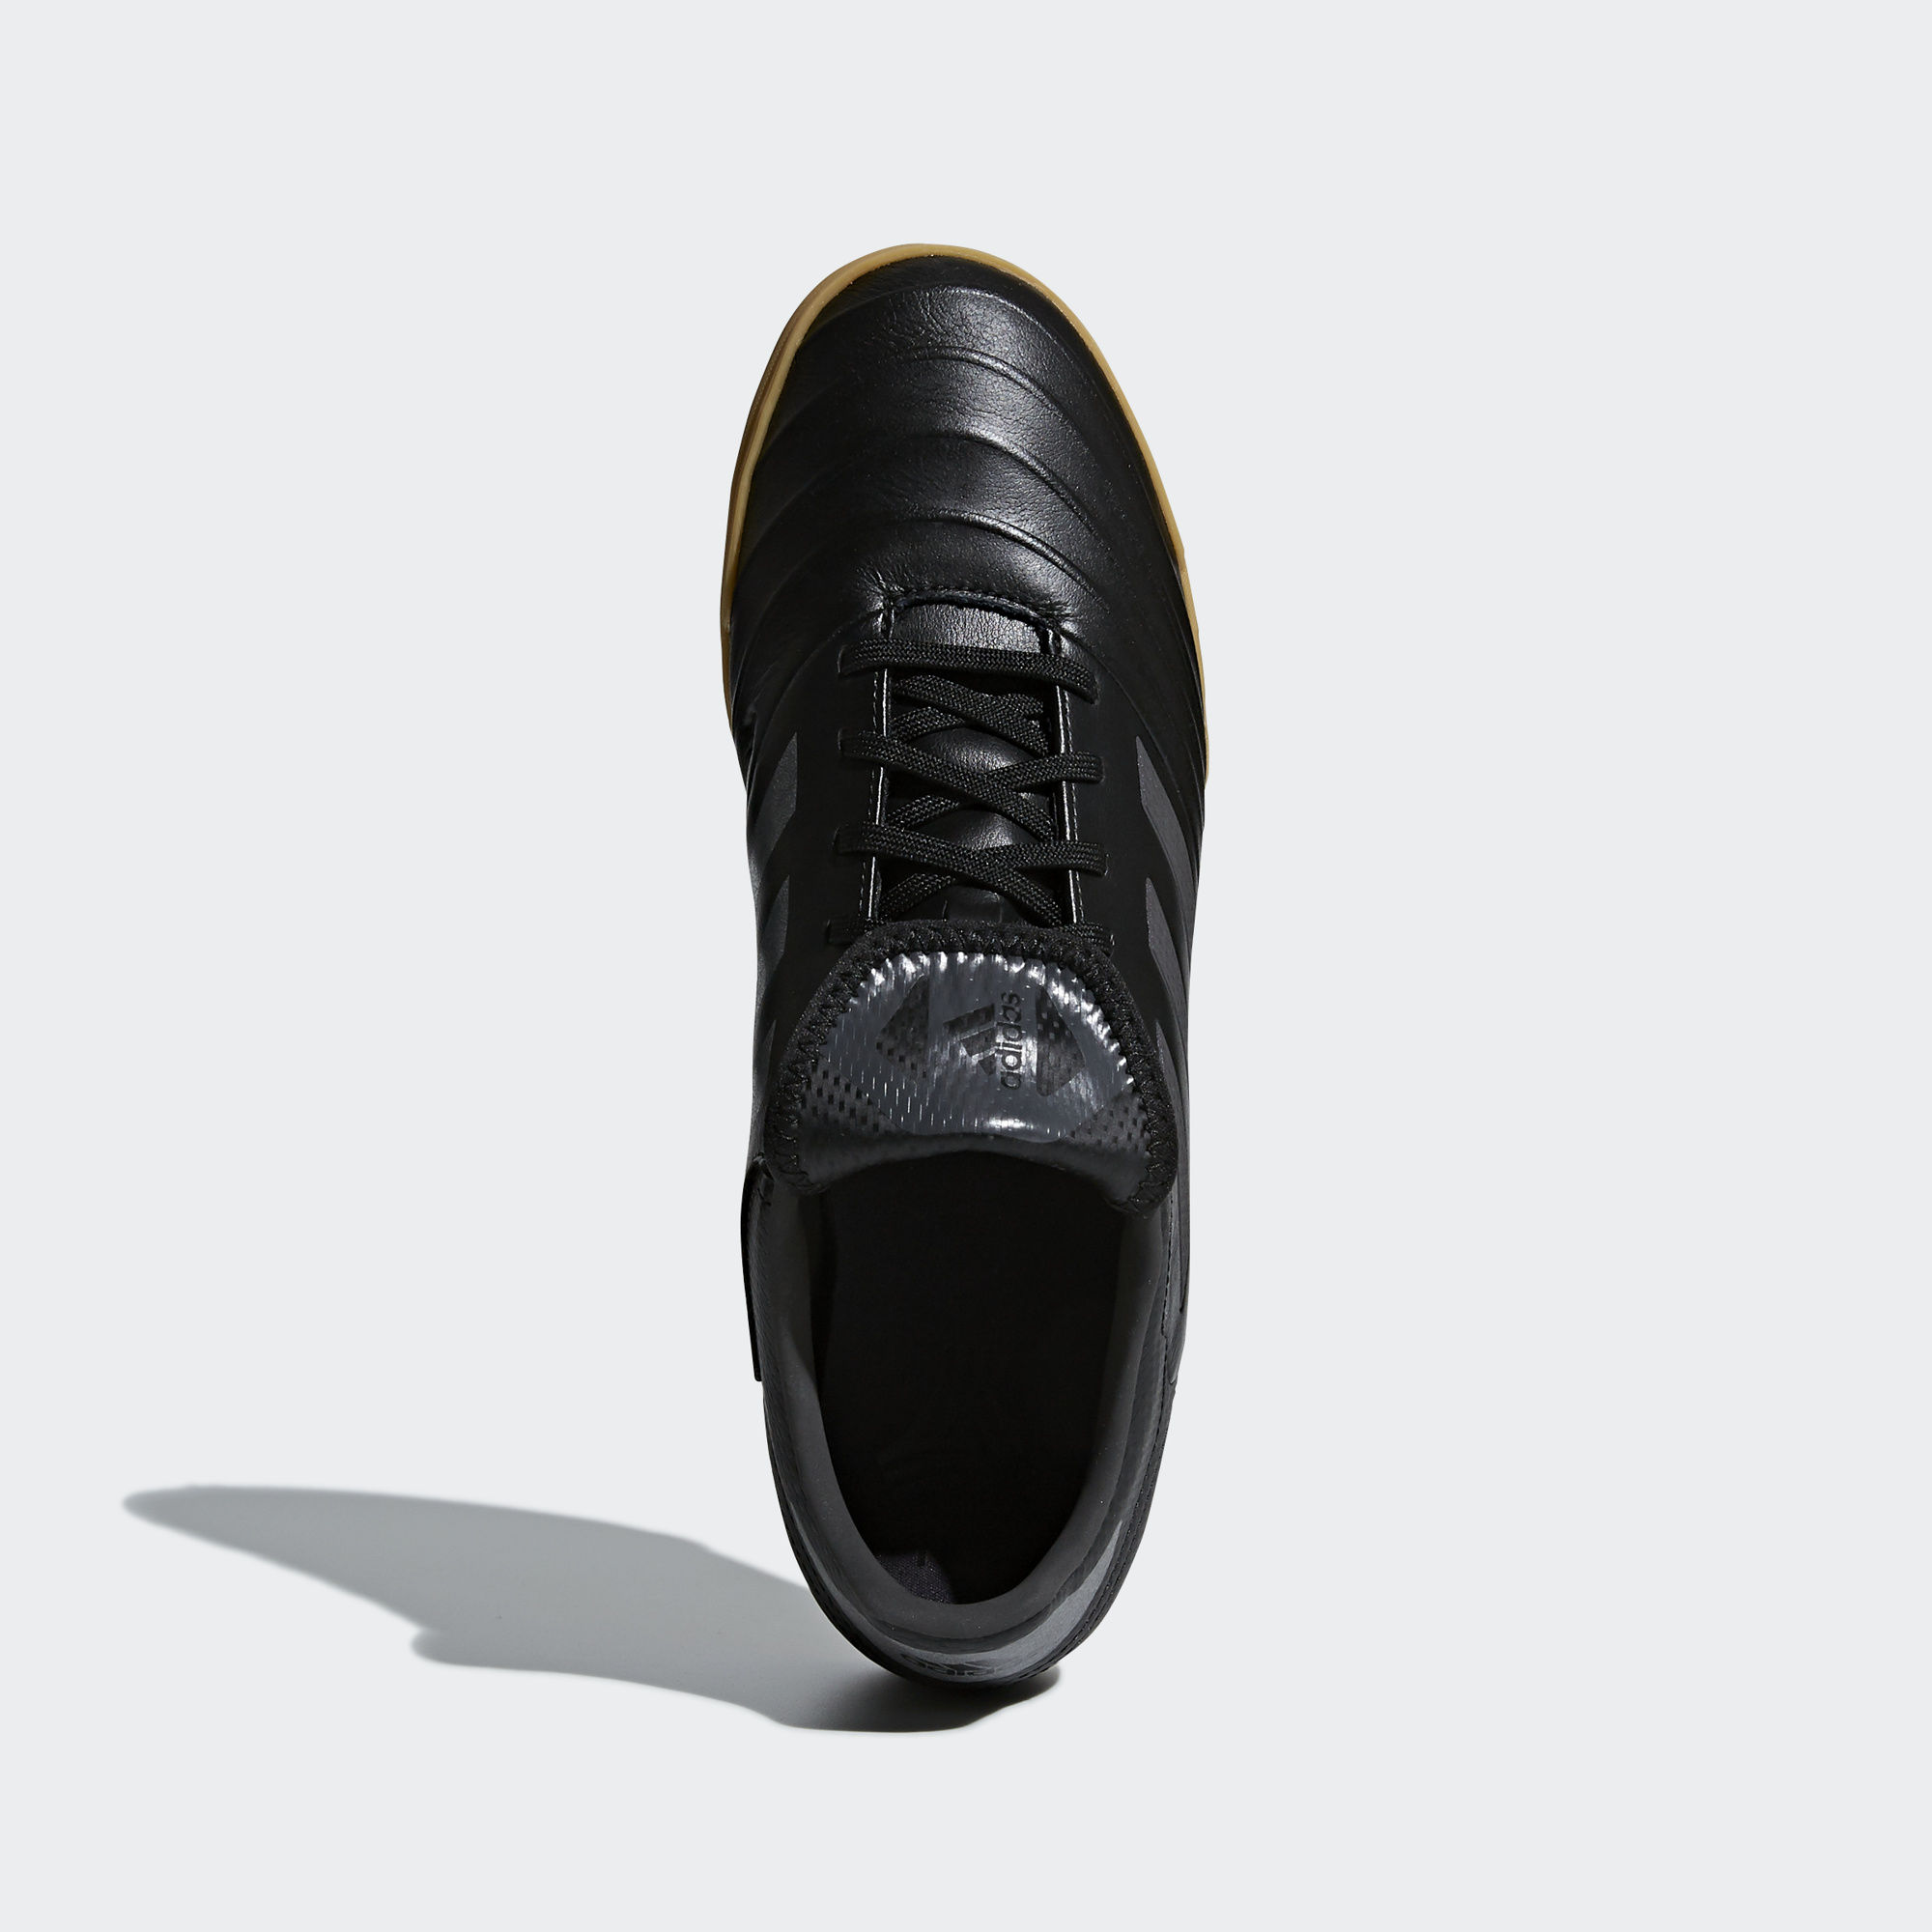 79b70309b Adidas Copa Tango 18.3 IN Nite Crawler - Core Black   Utility Black   Core  Black